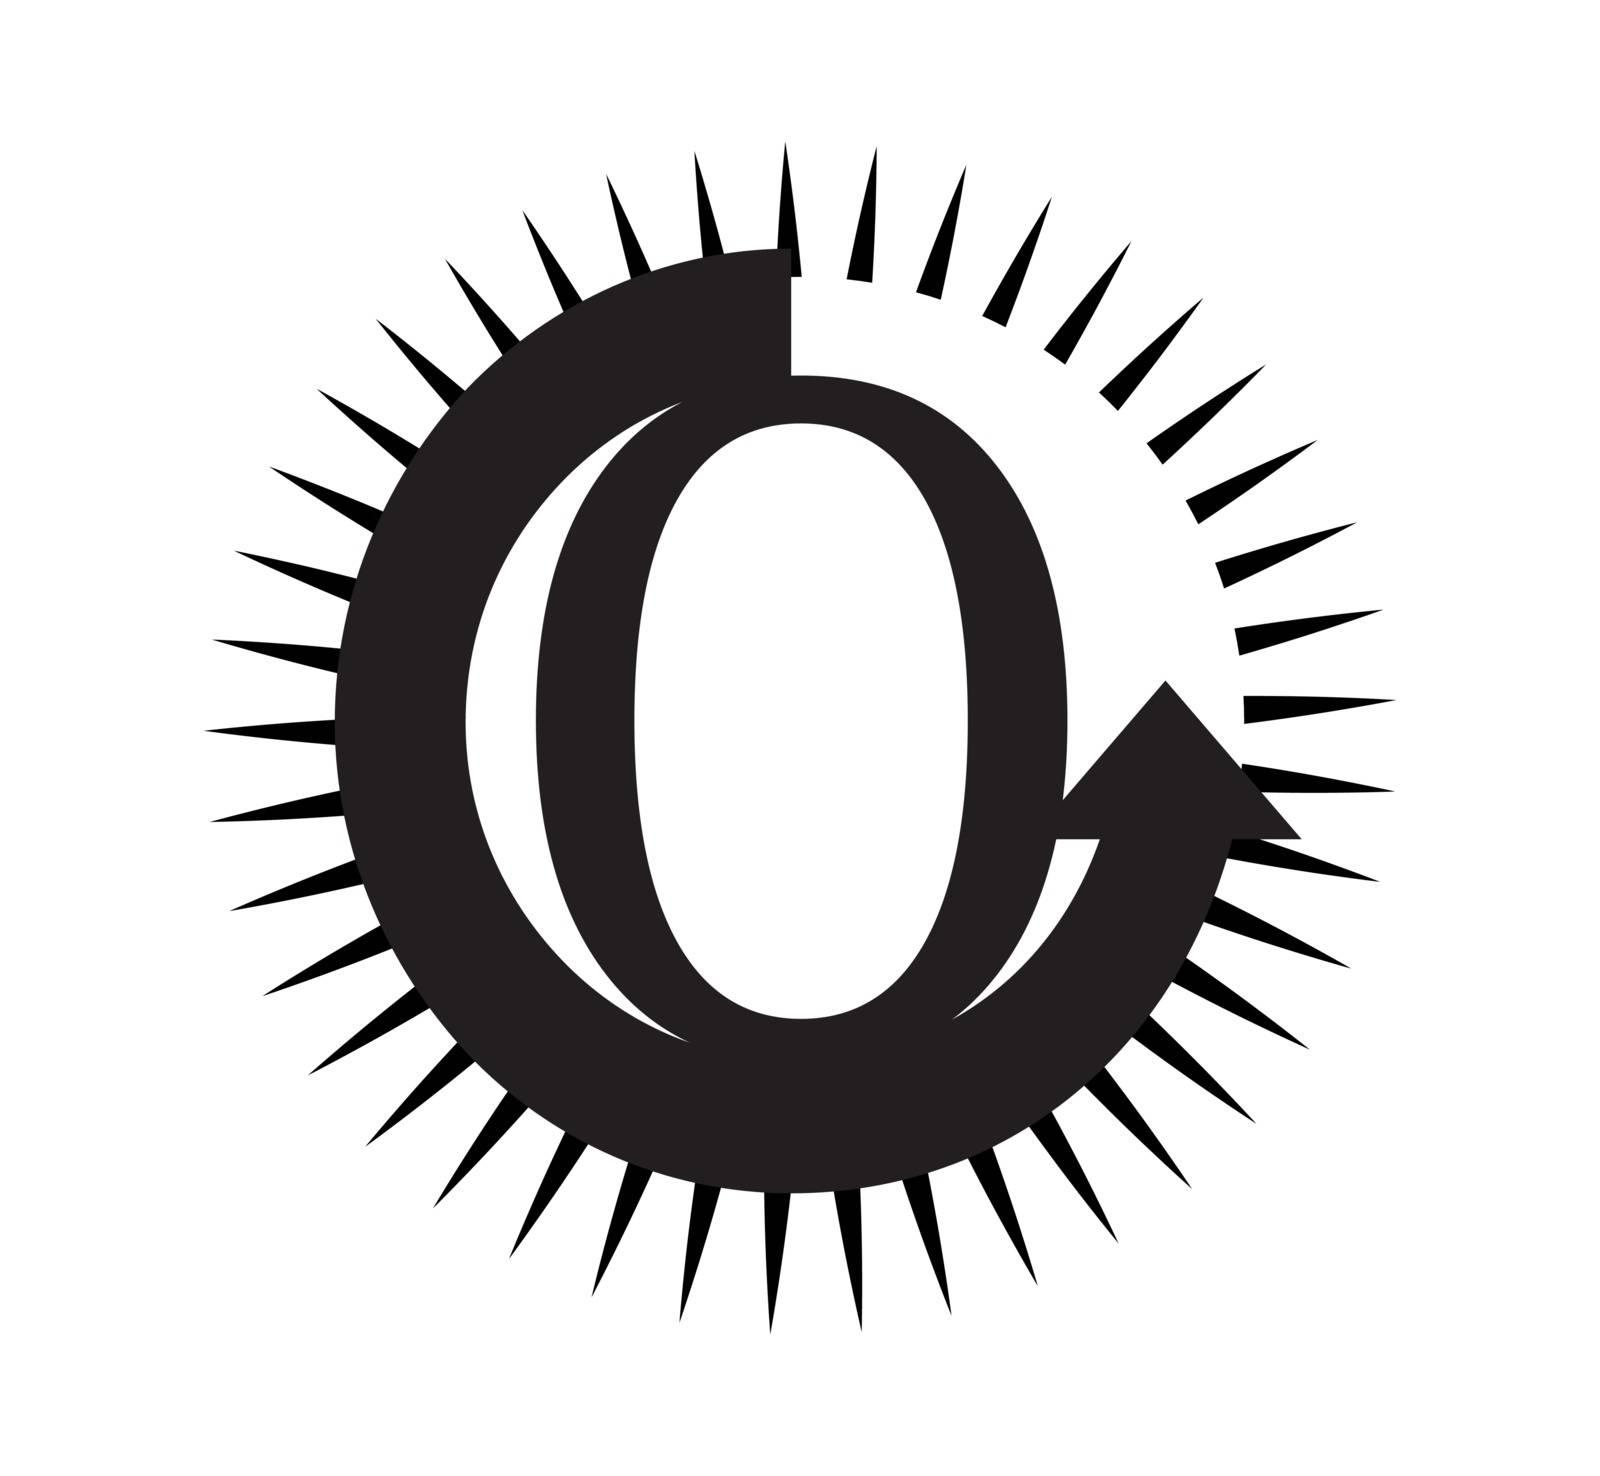 Logo concept design for O letter.